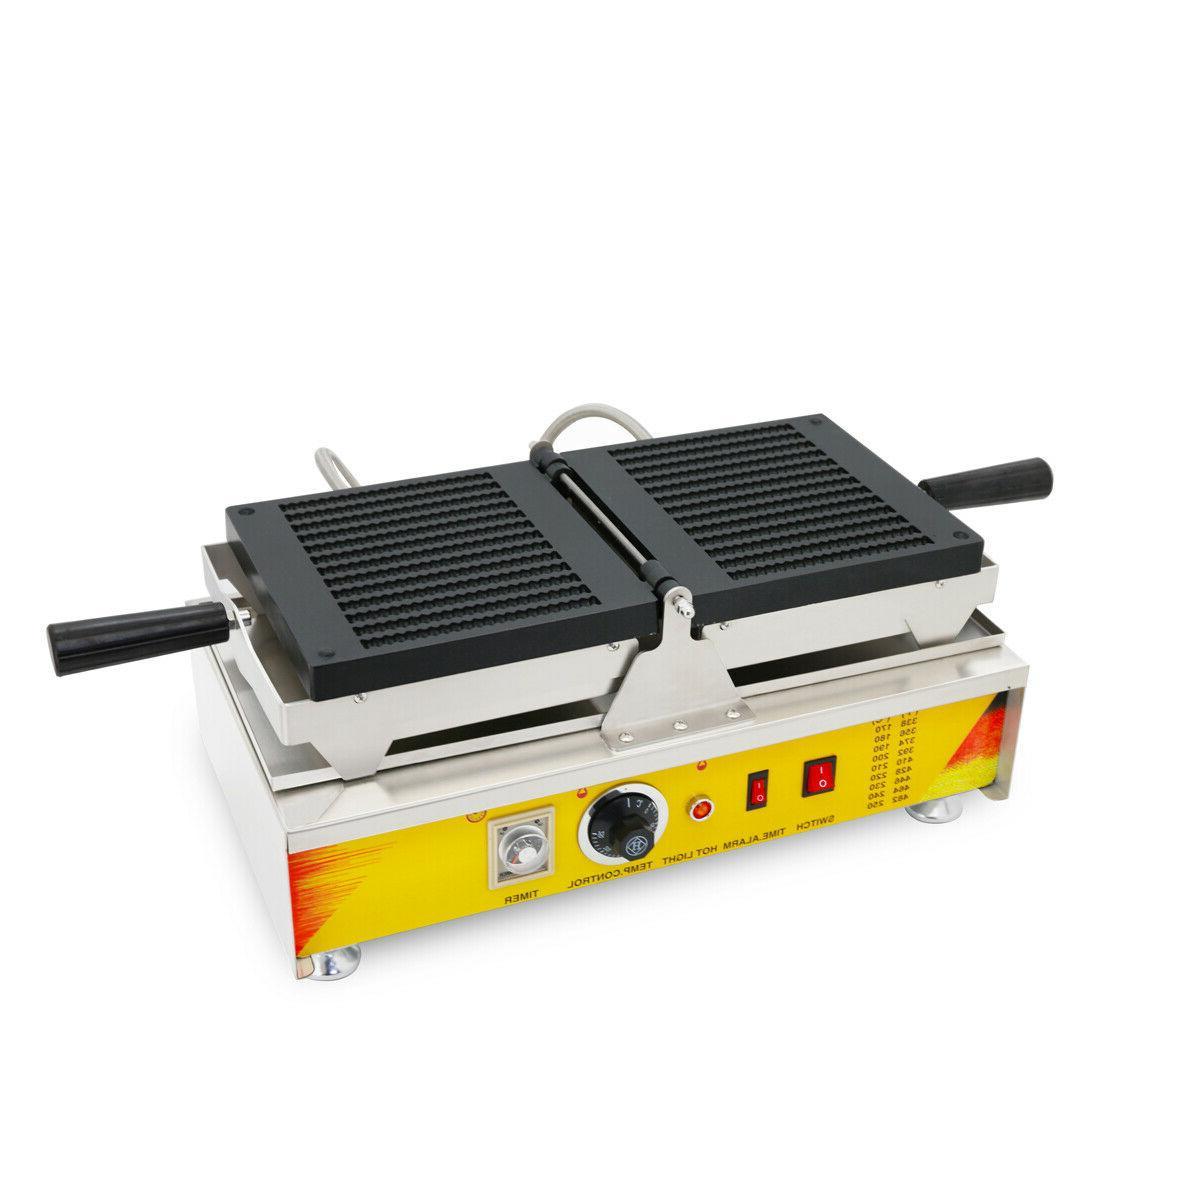 Commercial Nonstick Fries Stick Maker Machine Baker Iron Global